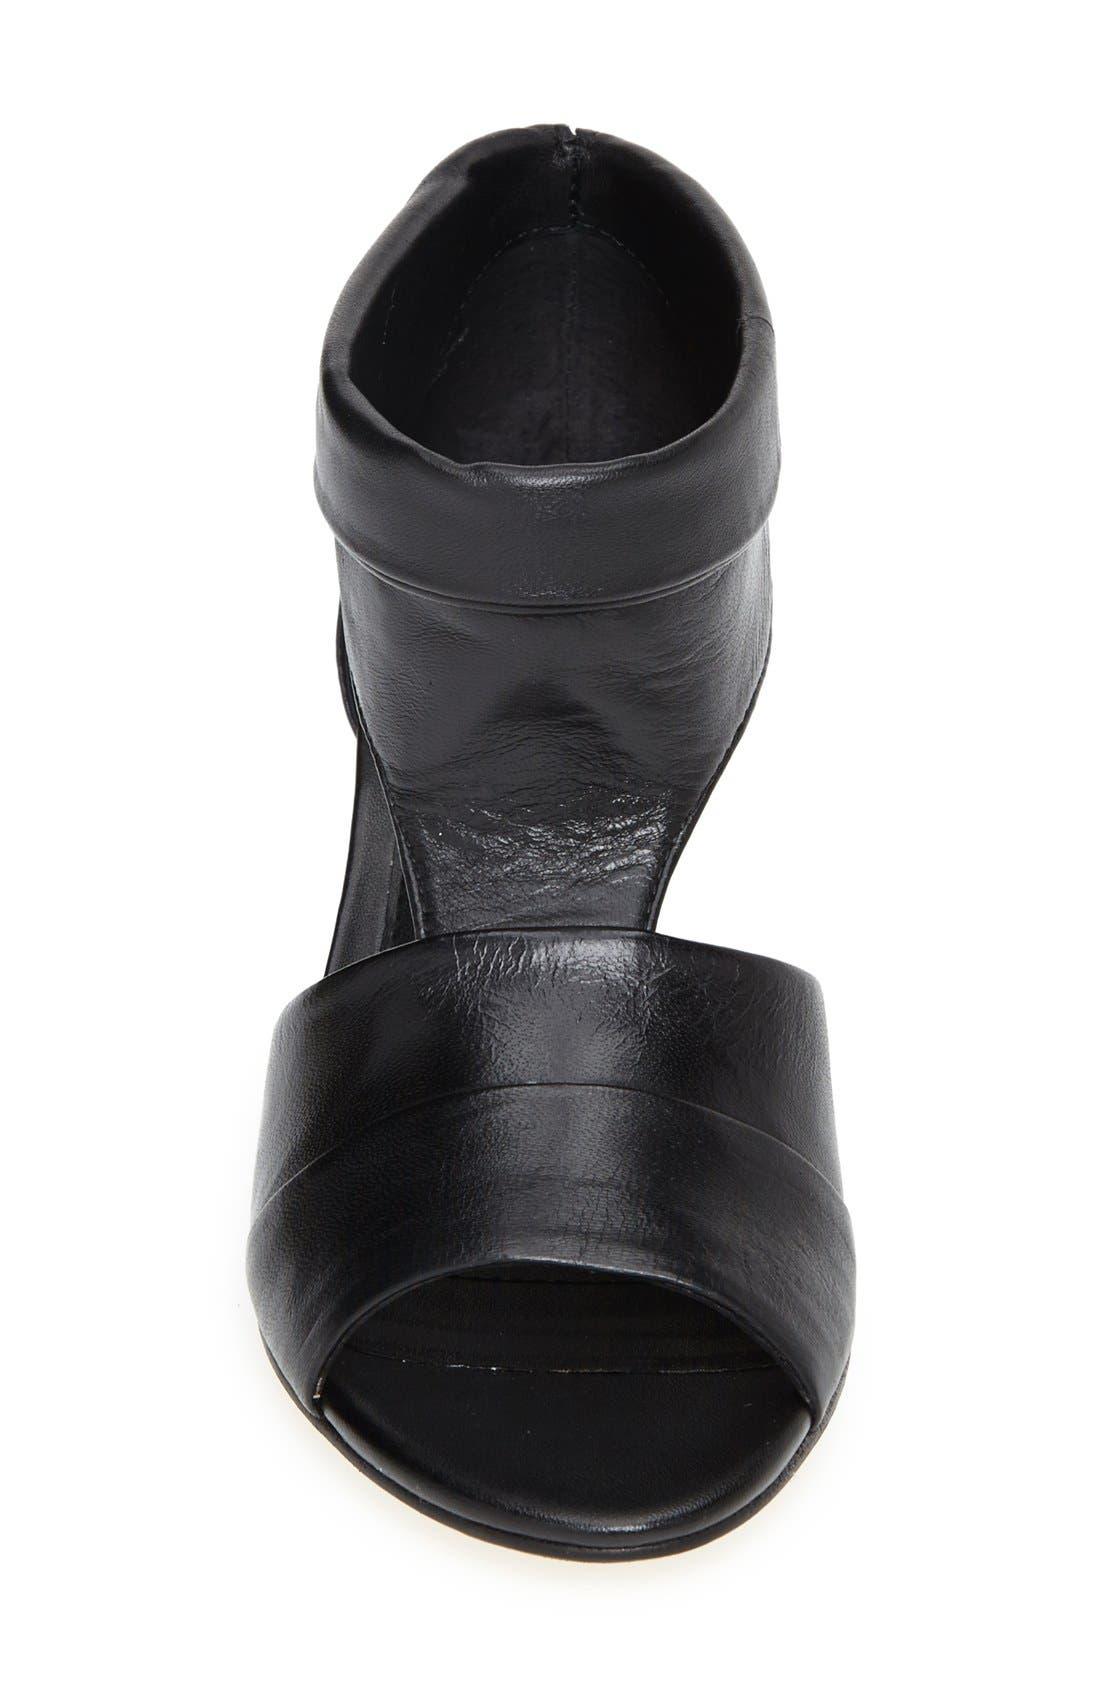 Alternate Image 3  - T Tahari 'Rumer' Cuff Leather Bootie (Women)